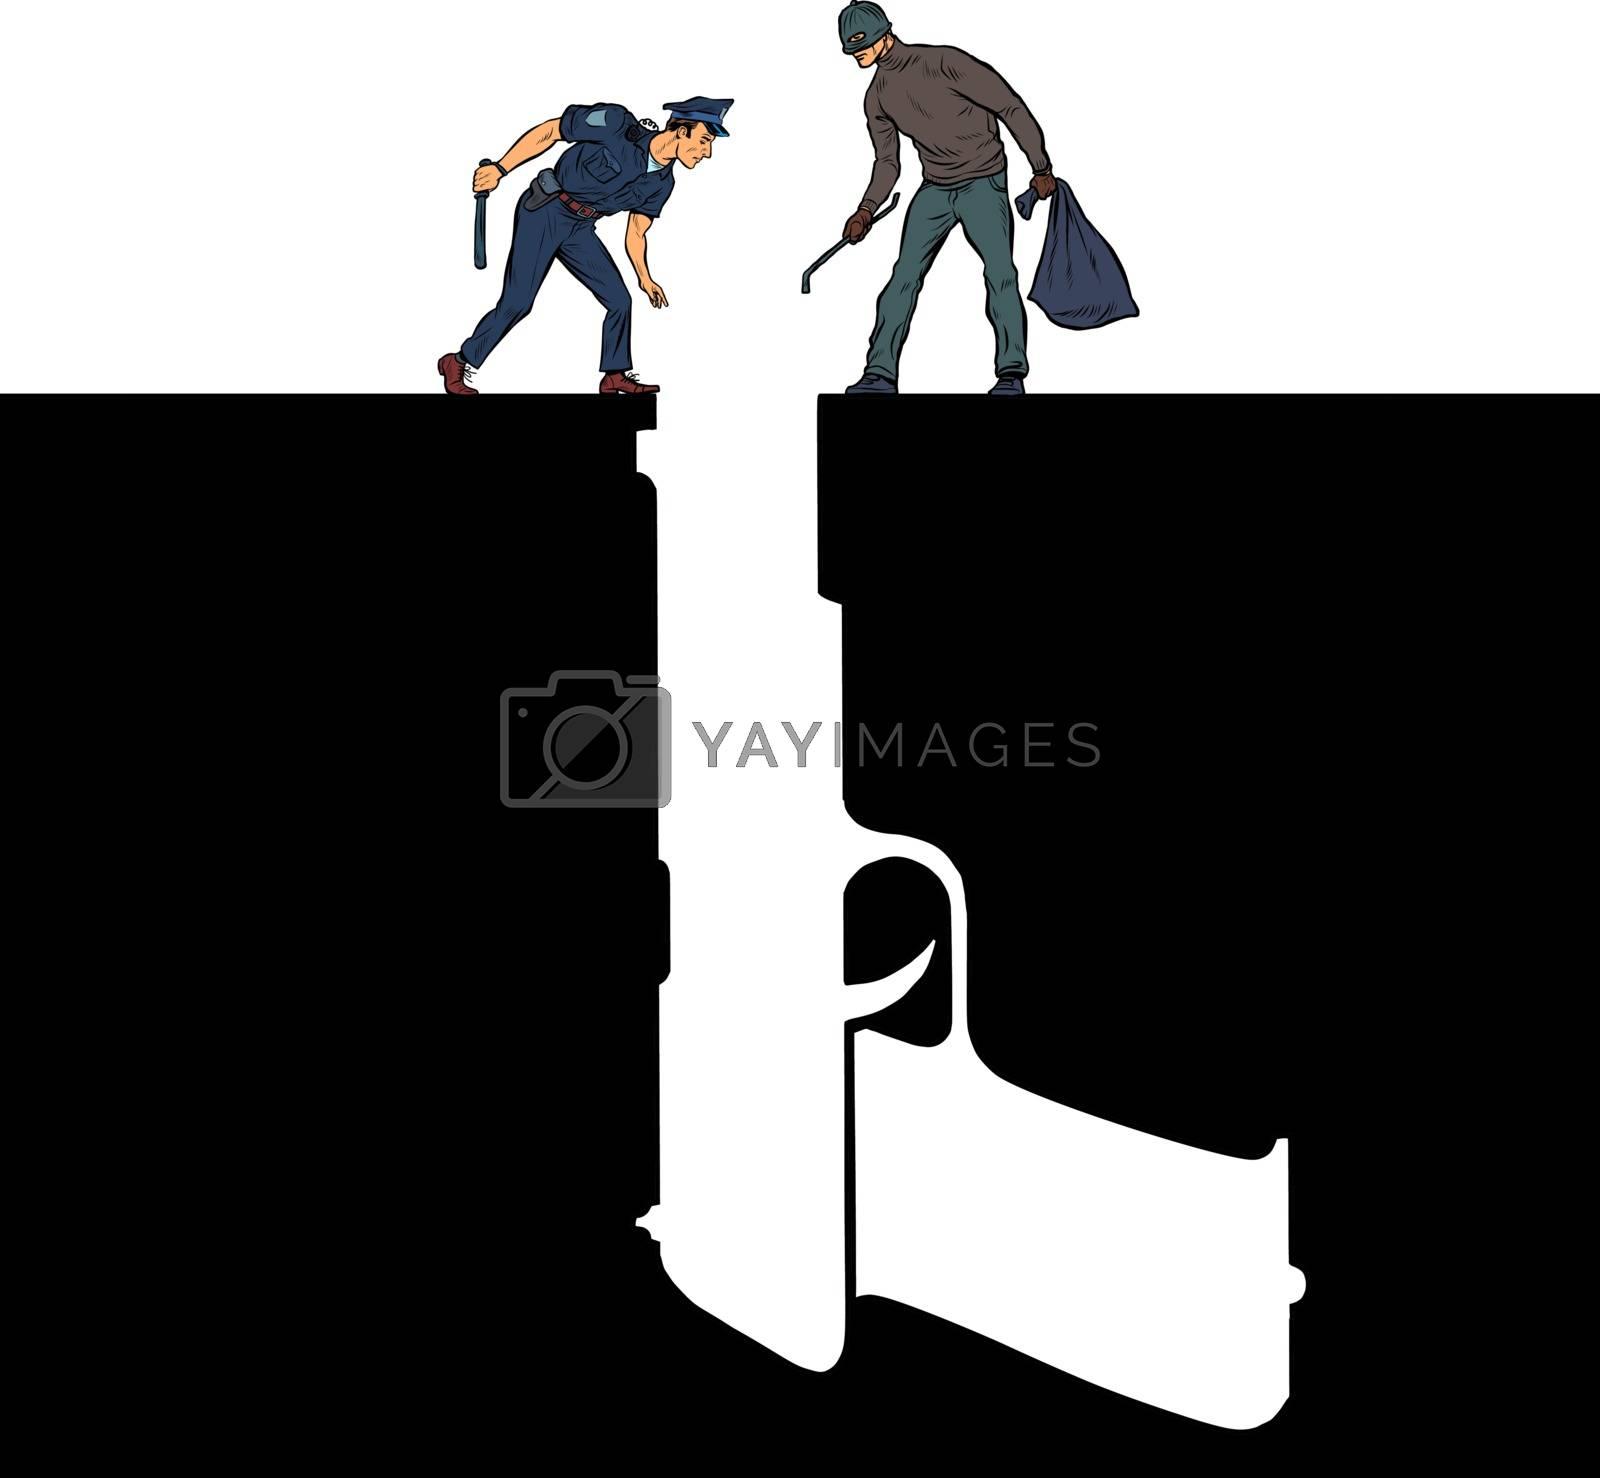 Gun police criminal crime detective. Pit silhouette. Pop art retro vector illustration 50s 60s style